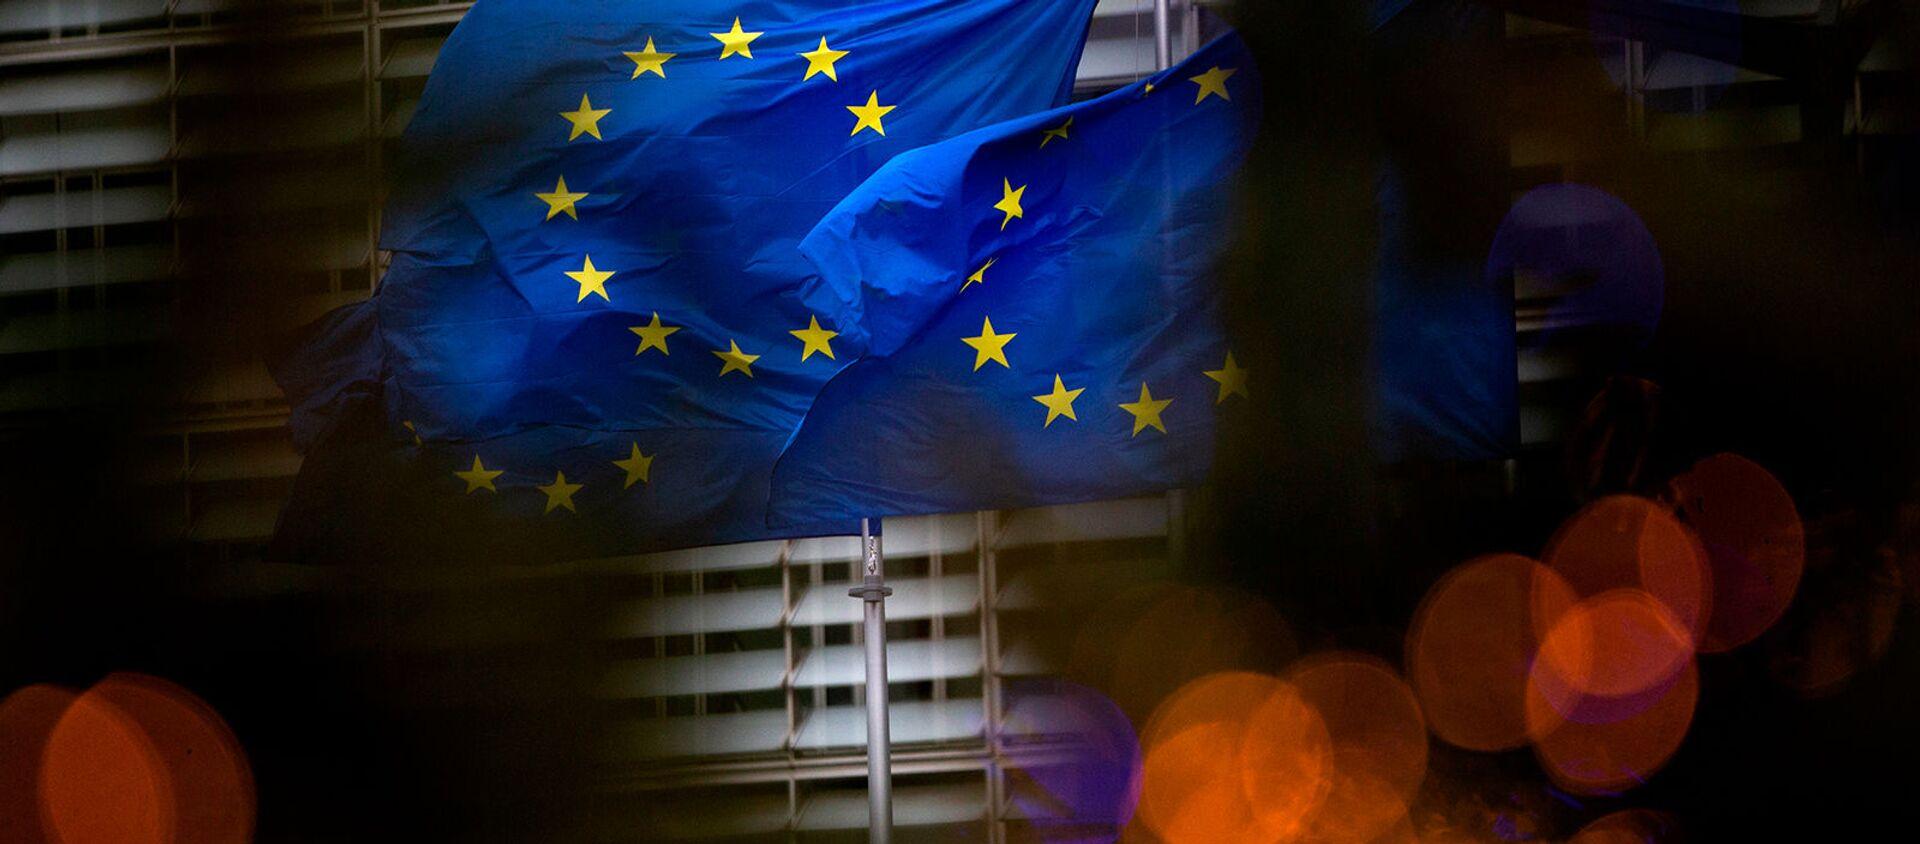 Флаги Европейского союза перед штаб-квартирой ЕС в Брюсселе - Sputnik Азербайджан, 1920, 12.02.2021